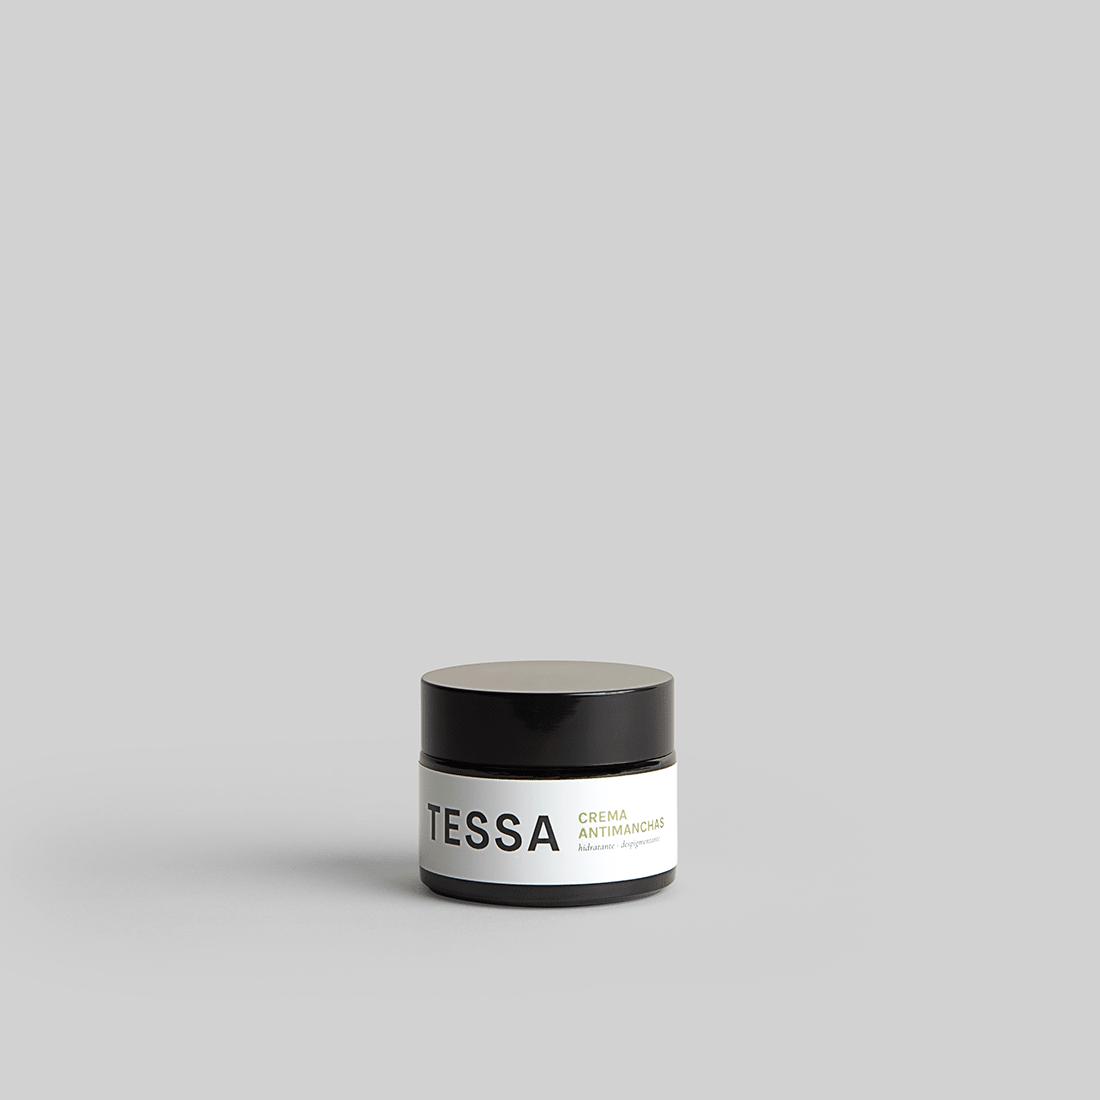 Crema Antimanchas - Tessa